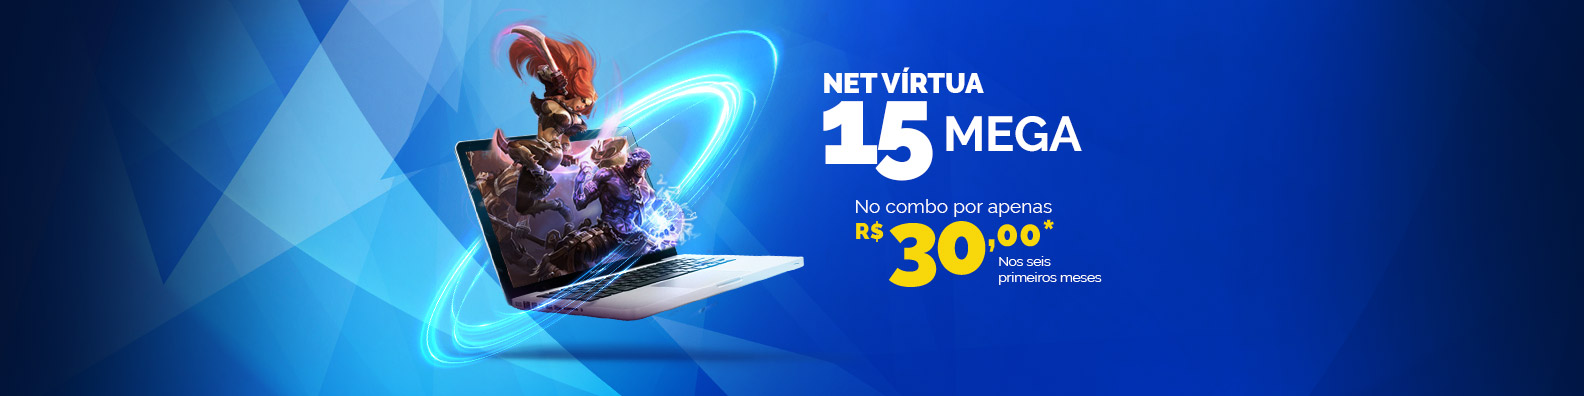 net virtua 15 mega por apenas 30 reais no combo nos seis primeiros meses